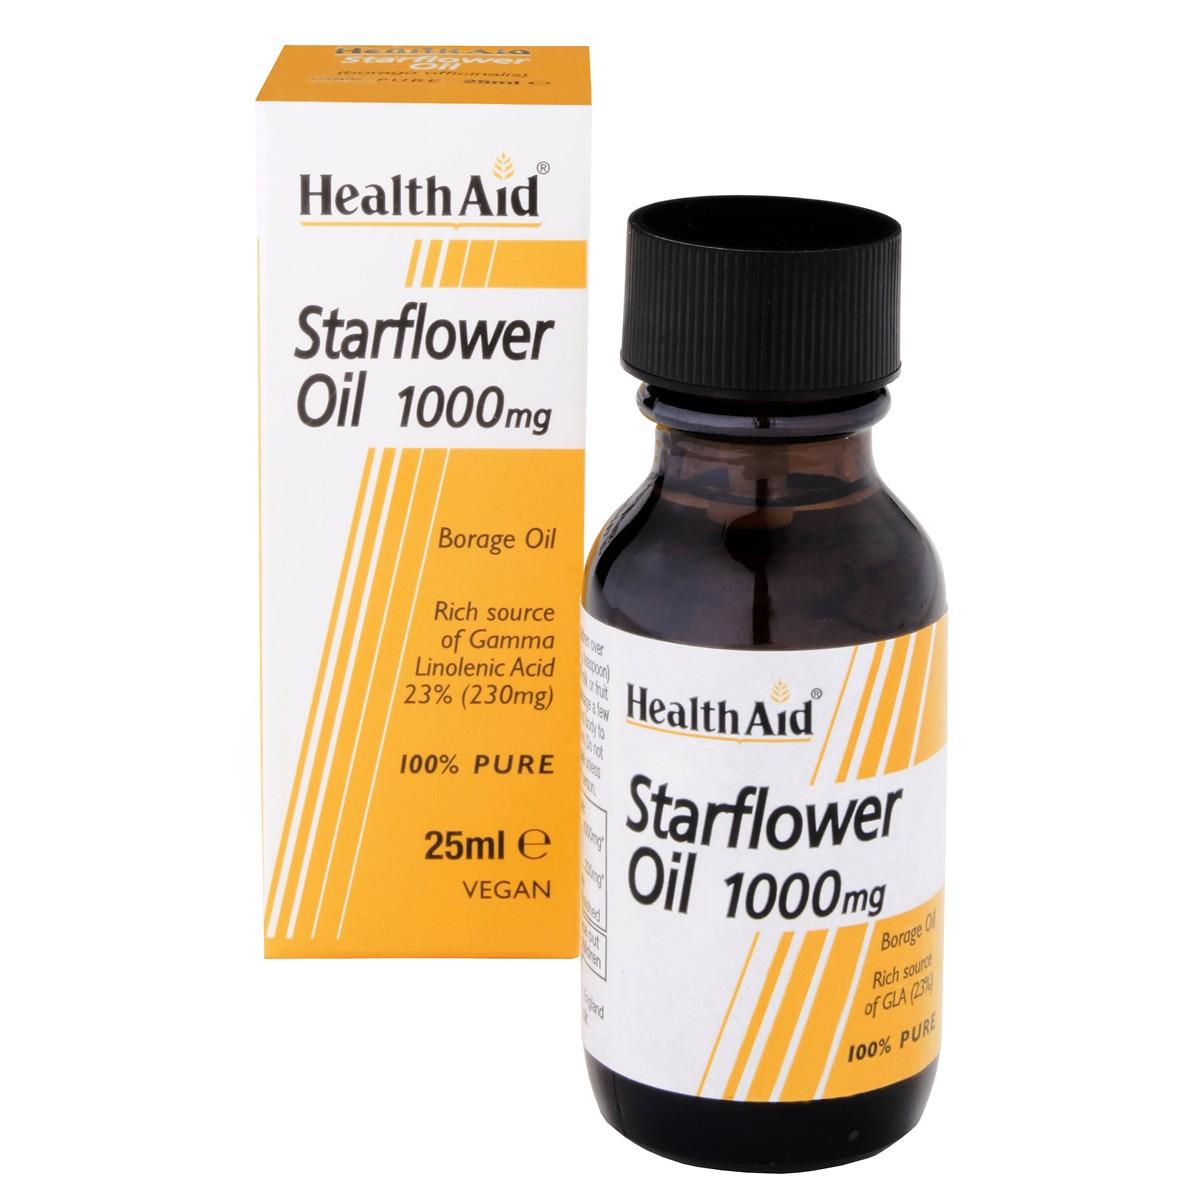 HealthAid Starflower Oil (23% GLA)